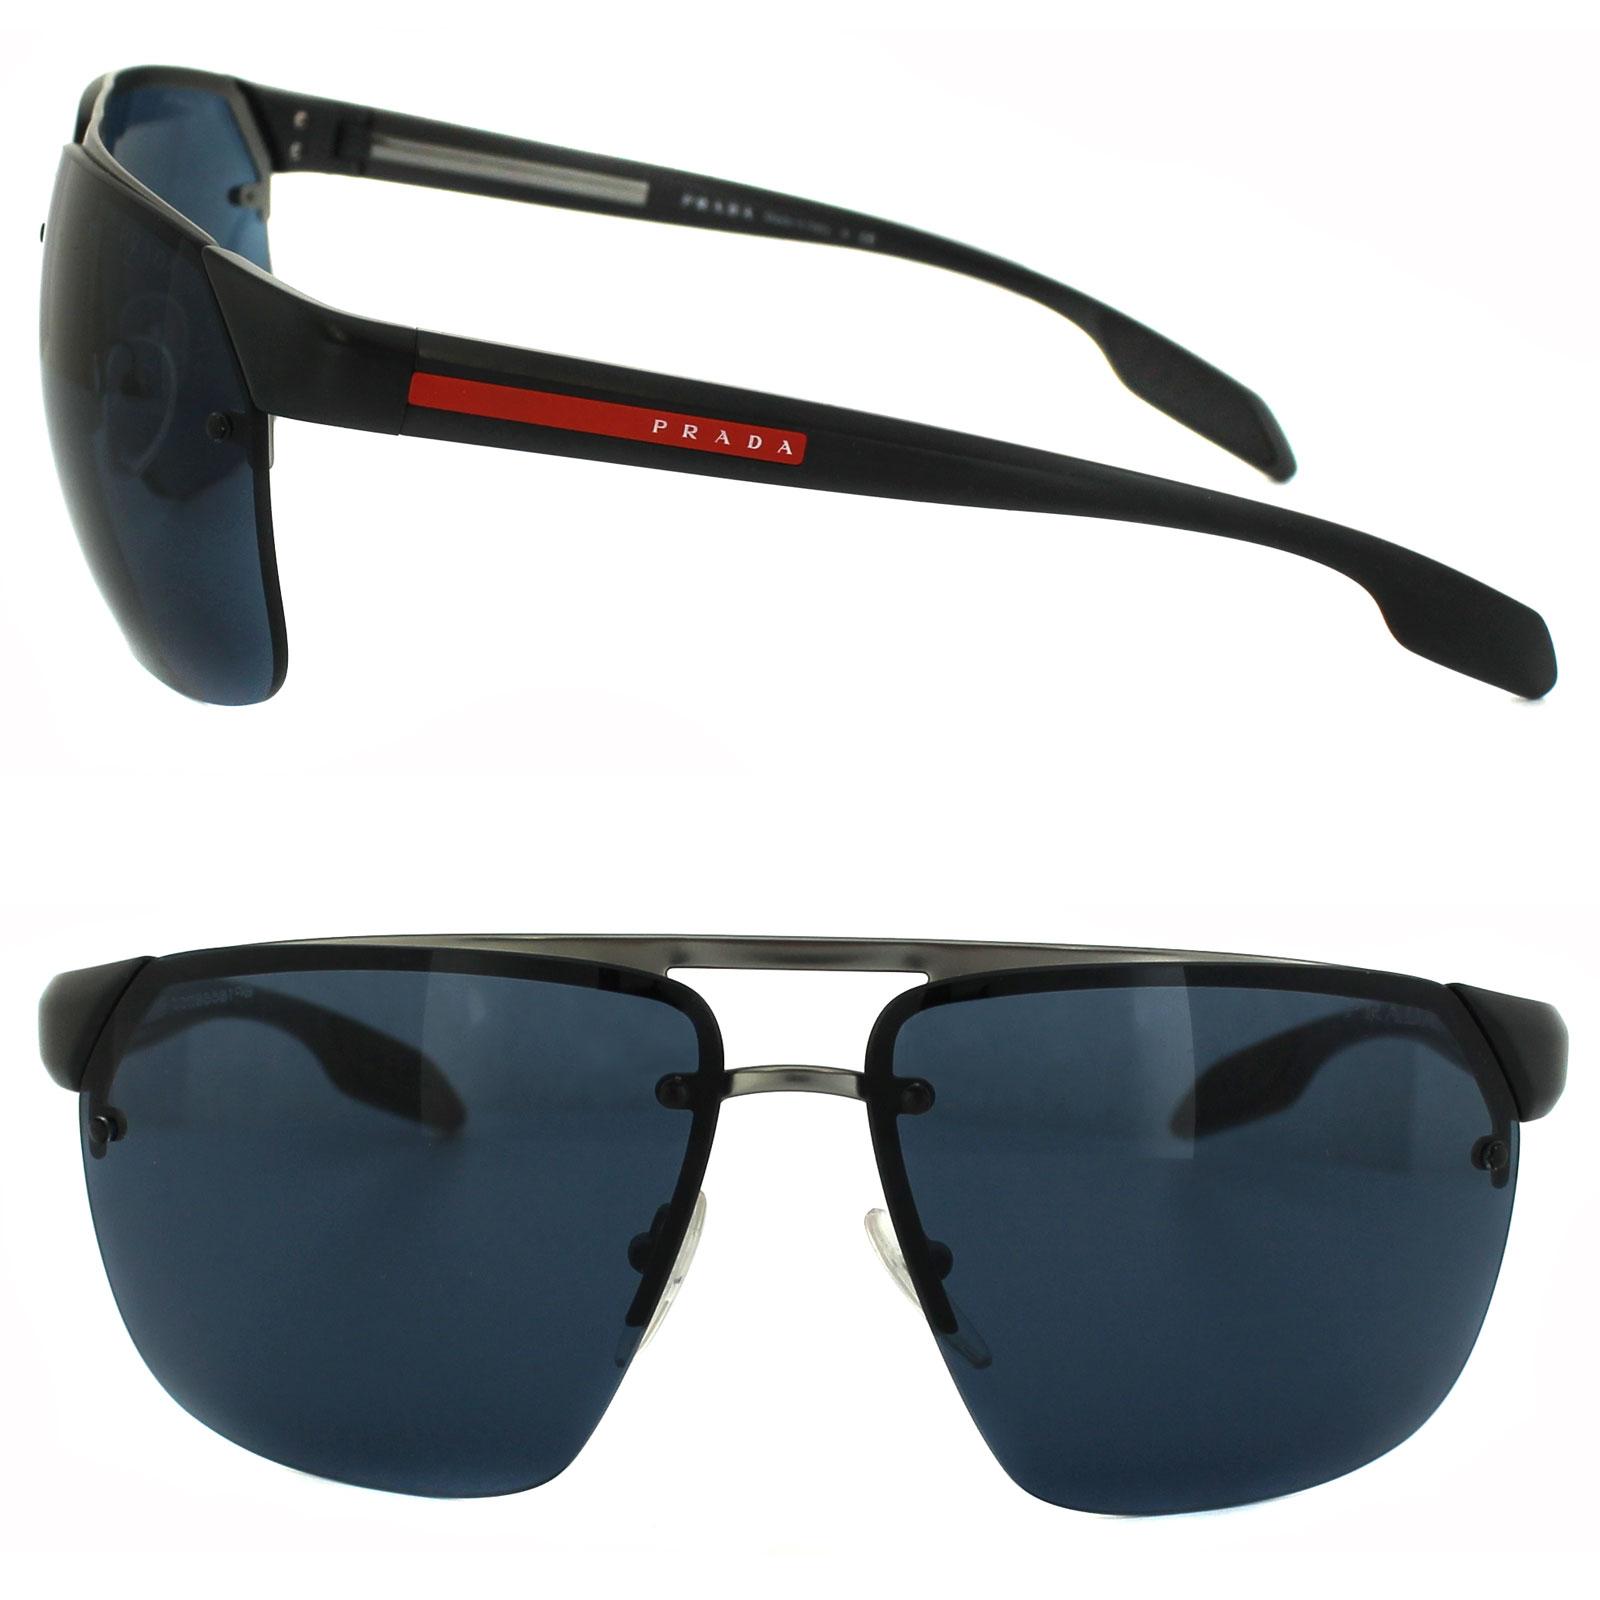 1dfa72fbf9ed Cheap Prada Sunglasses Australia